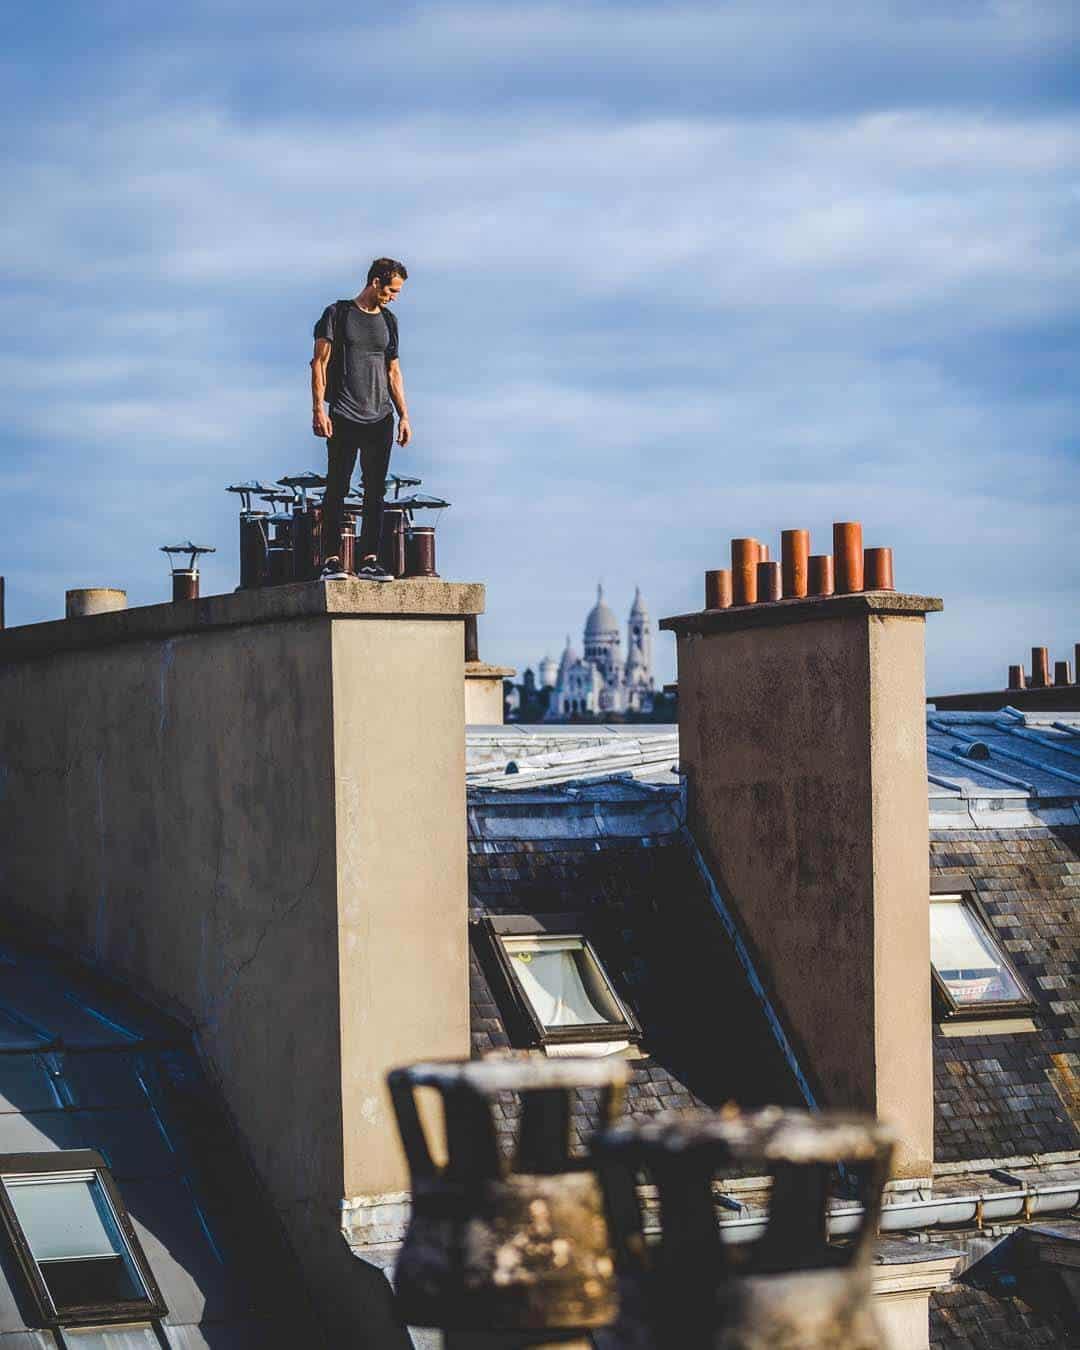 etrefort thibaut parkour clothing outdor paris rooftop pov looking down